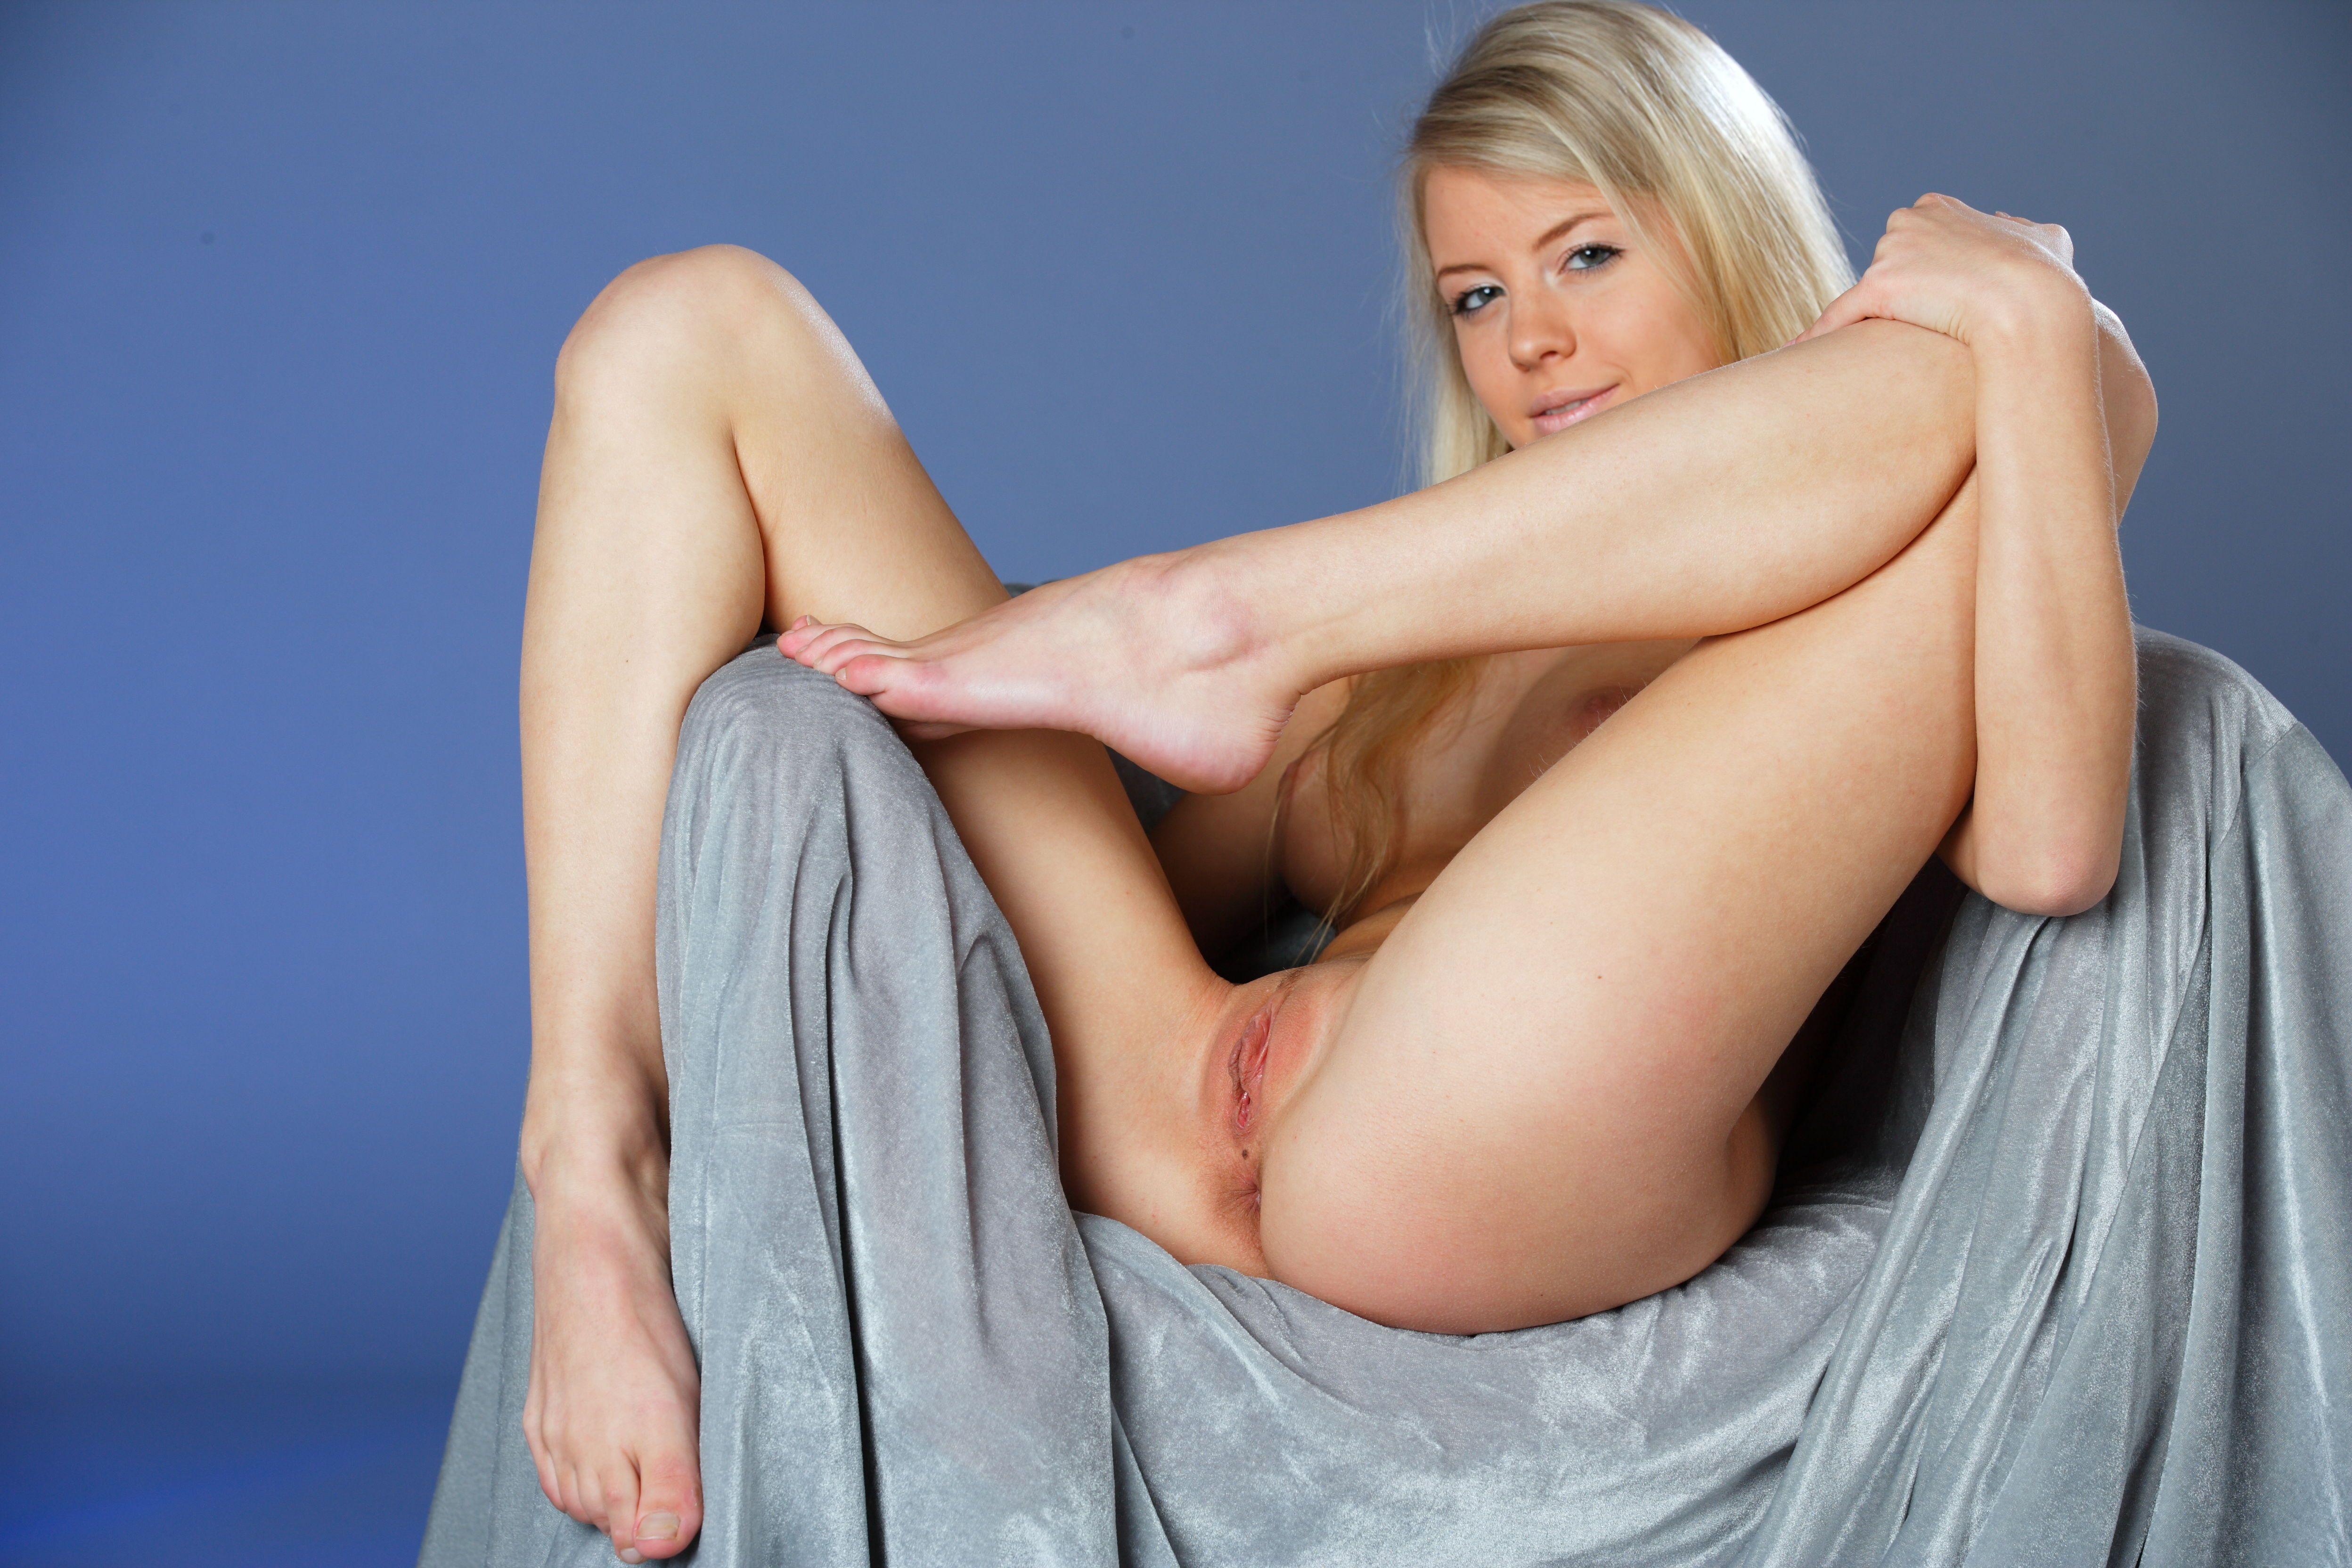 Wallpaper Barbara D, Blonde, Sexy Girl, Adult Model -3426